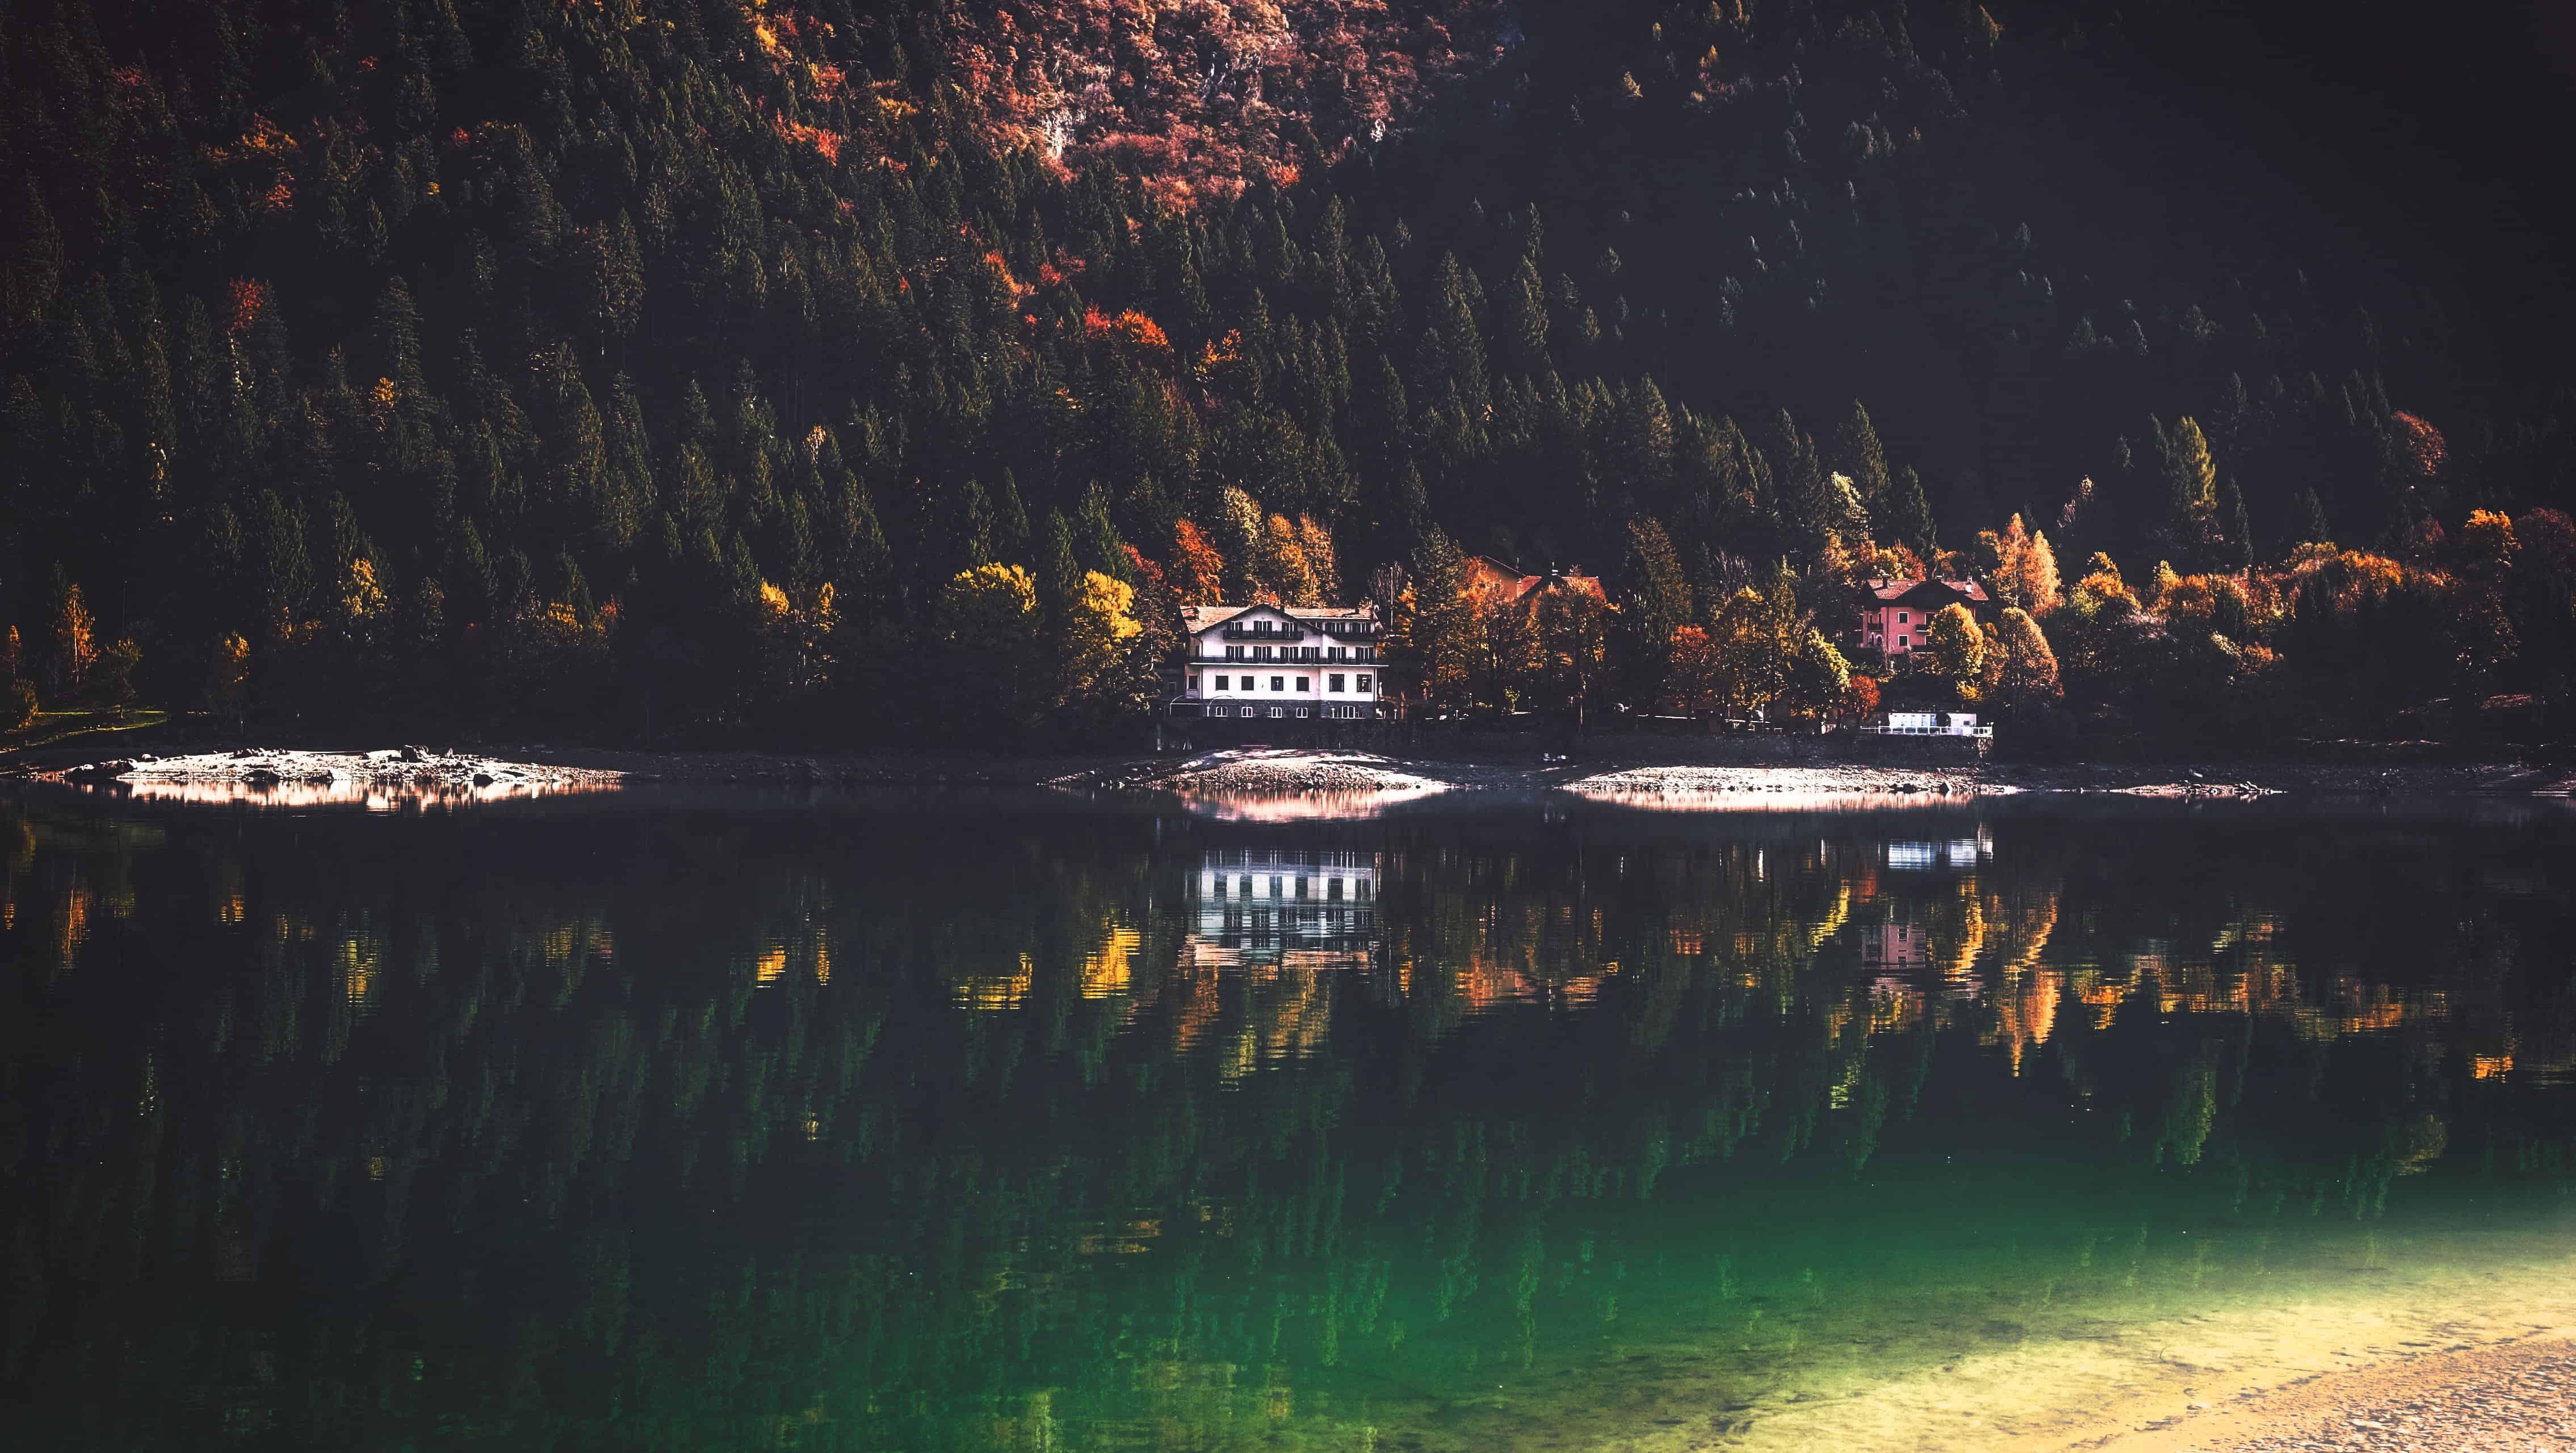 (credit: cristina gottardi) lake house nature